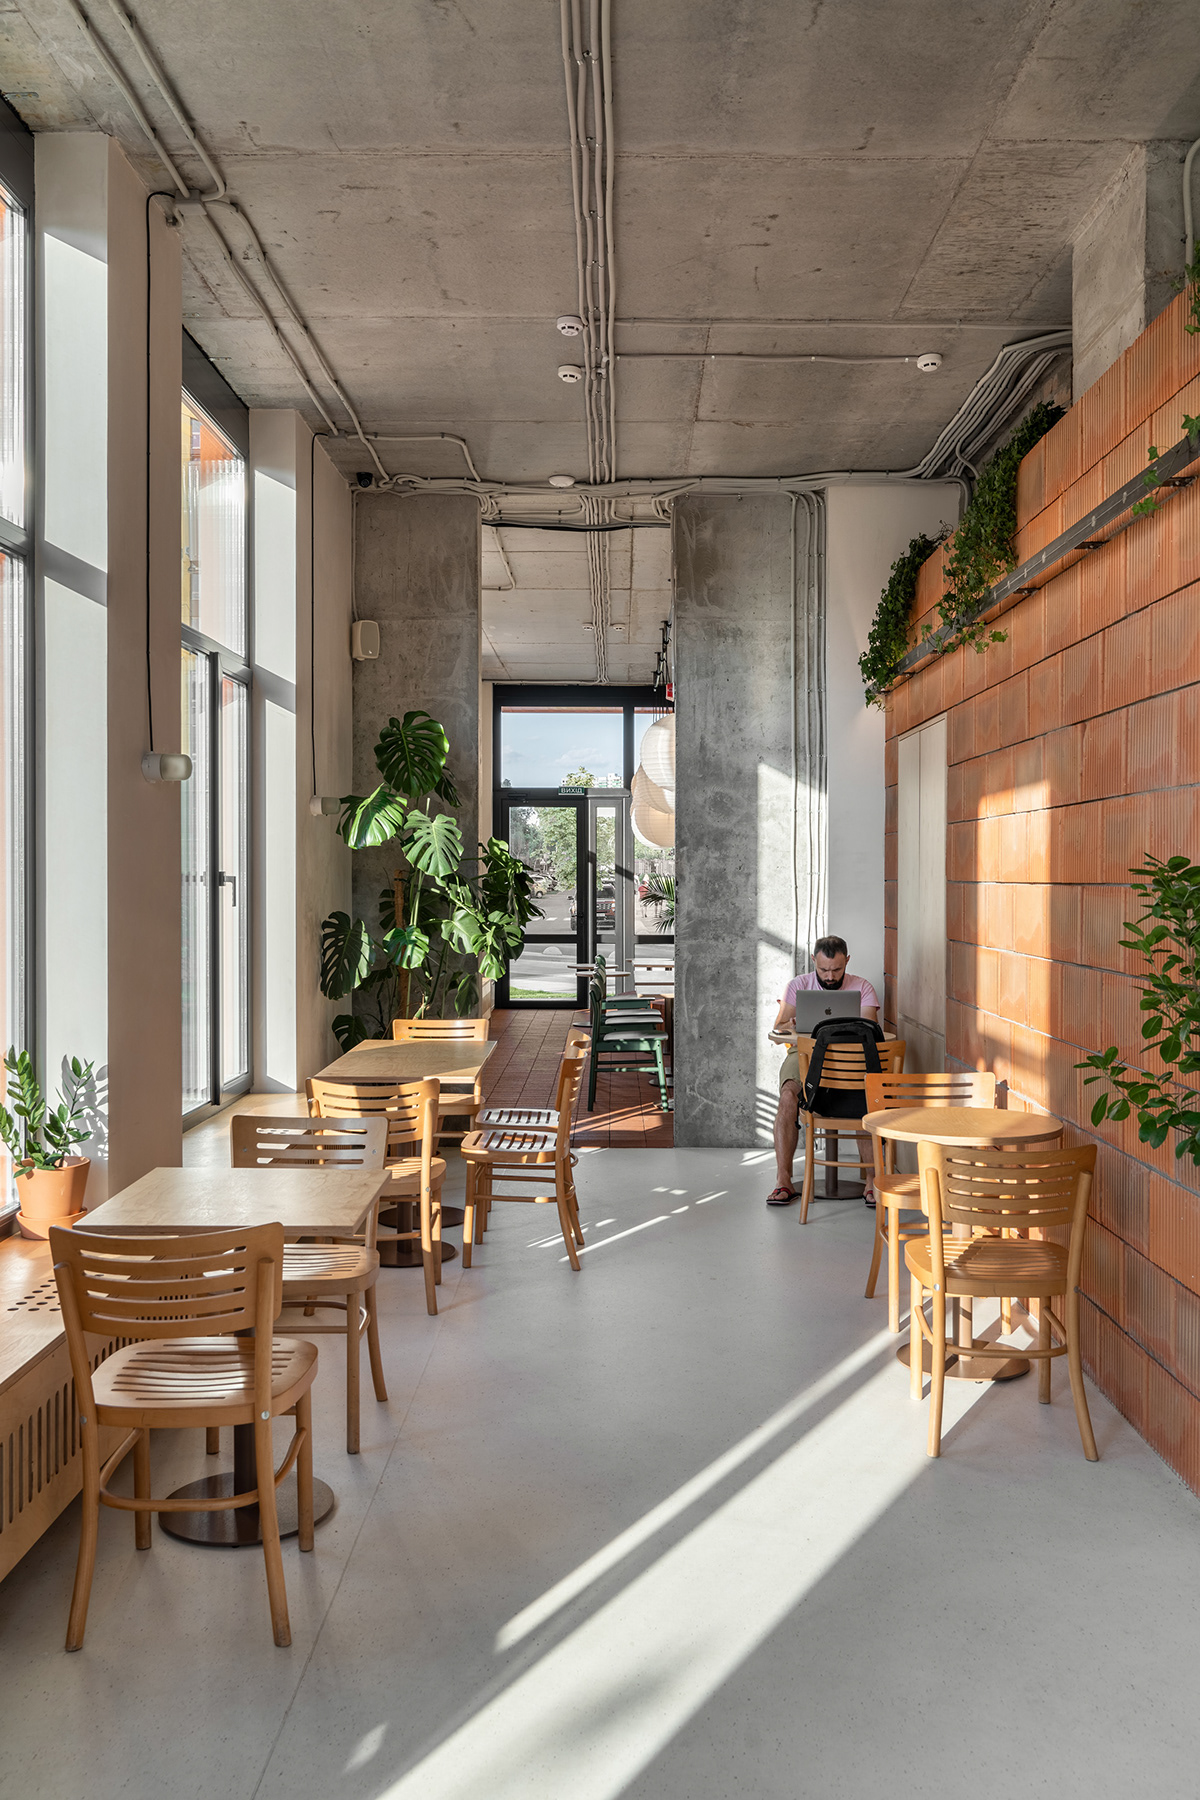 architecture cafe commercial design Interior Kyiv modern shop ukraine